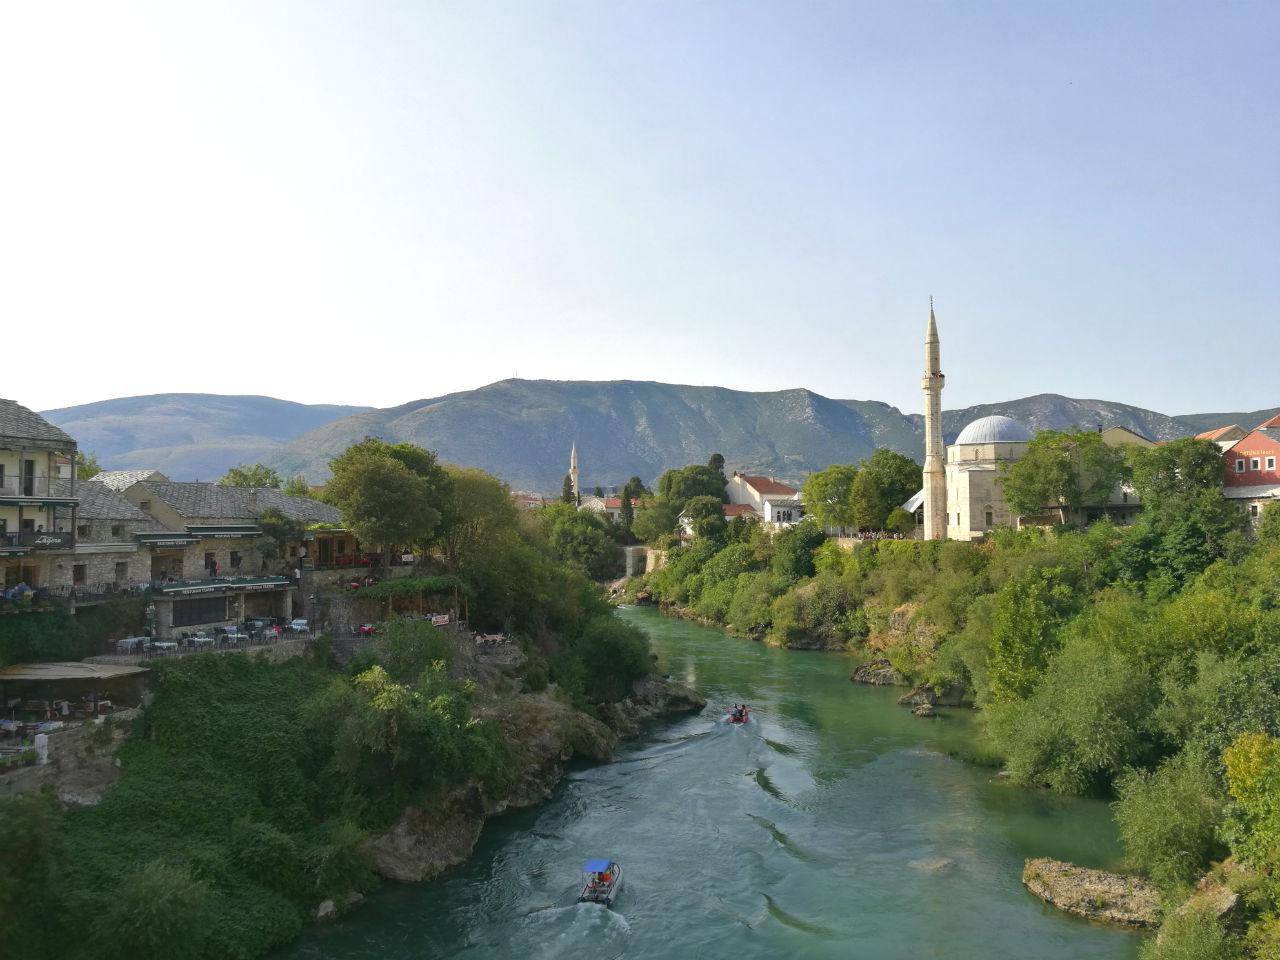 Mostar_Städtereise_Kurztrip_Ausblick